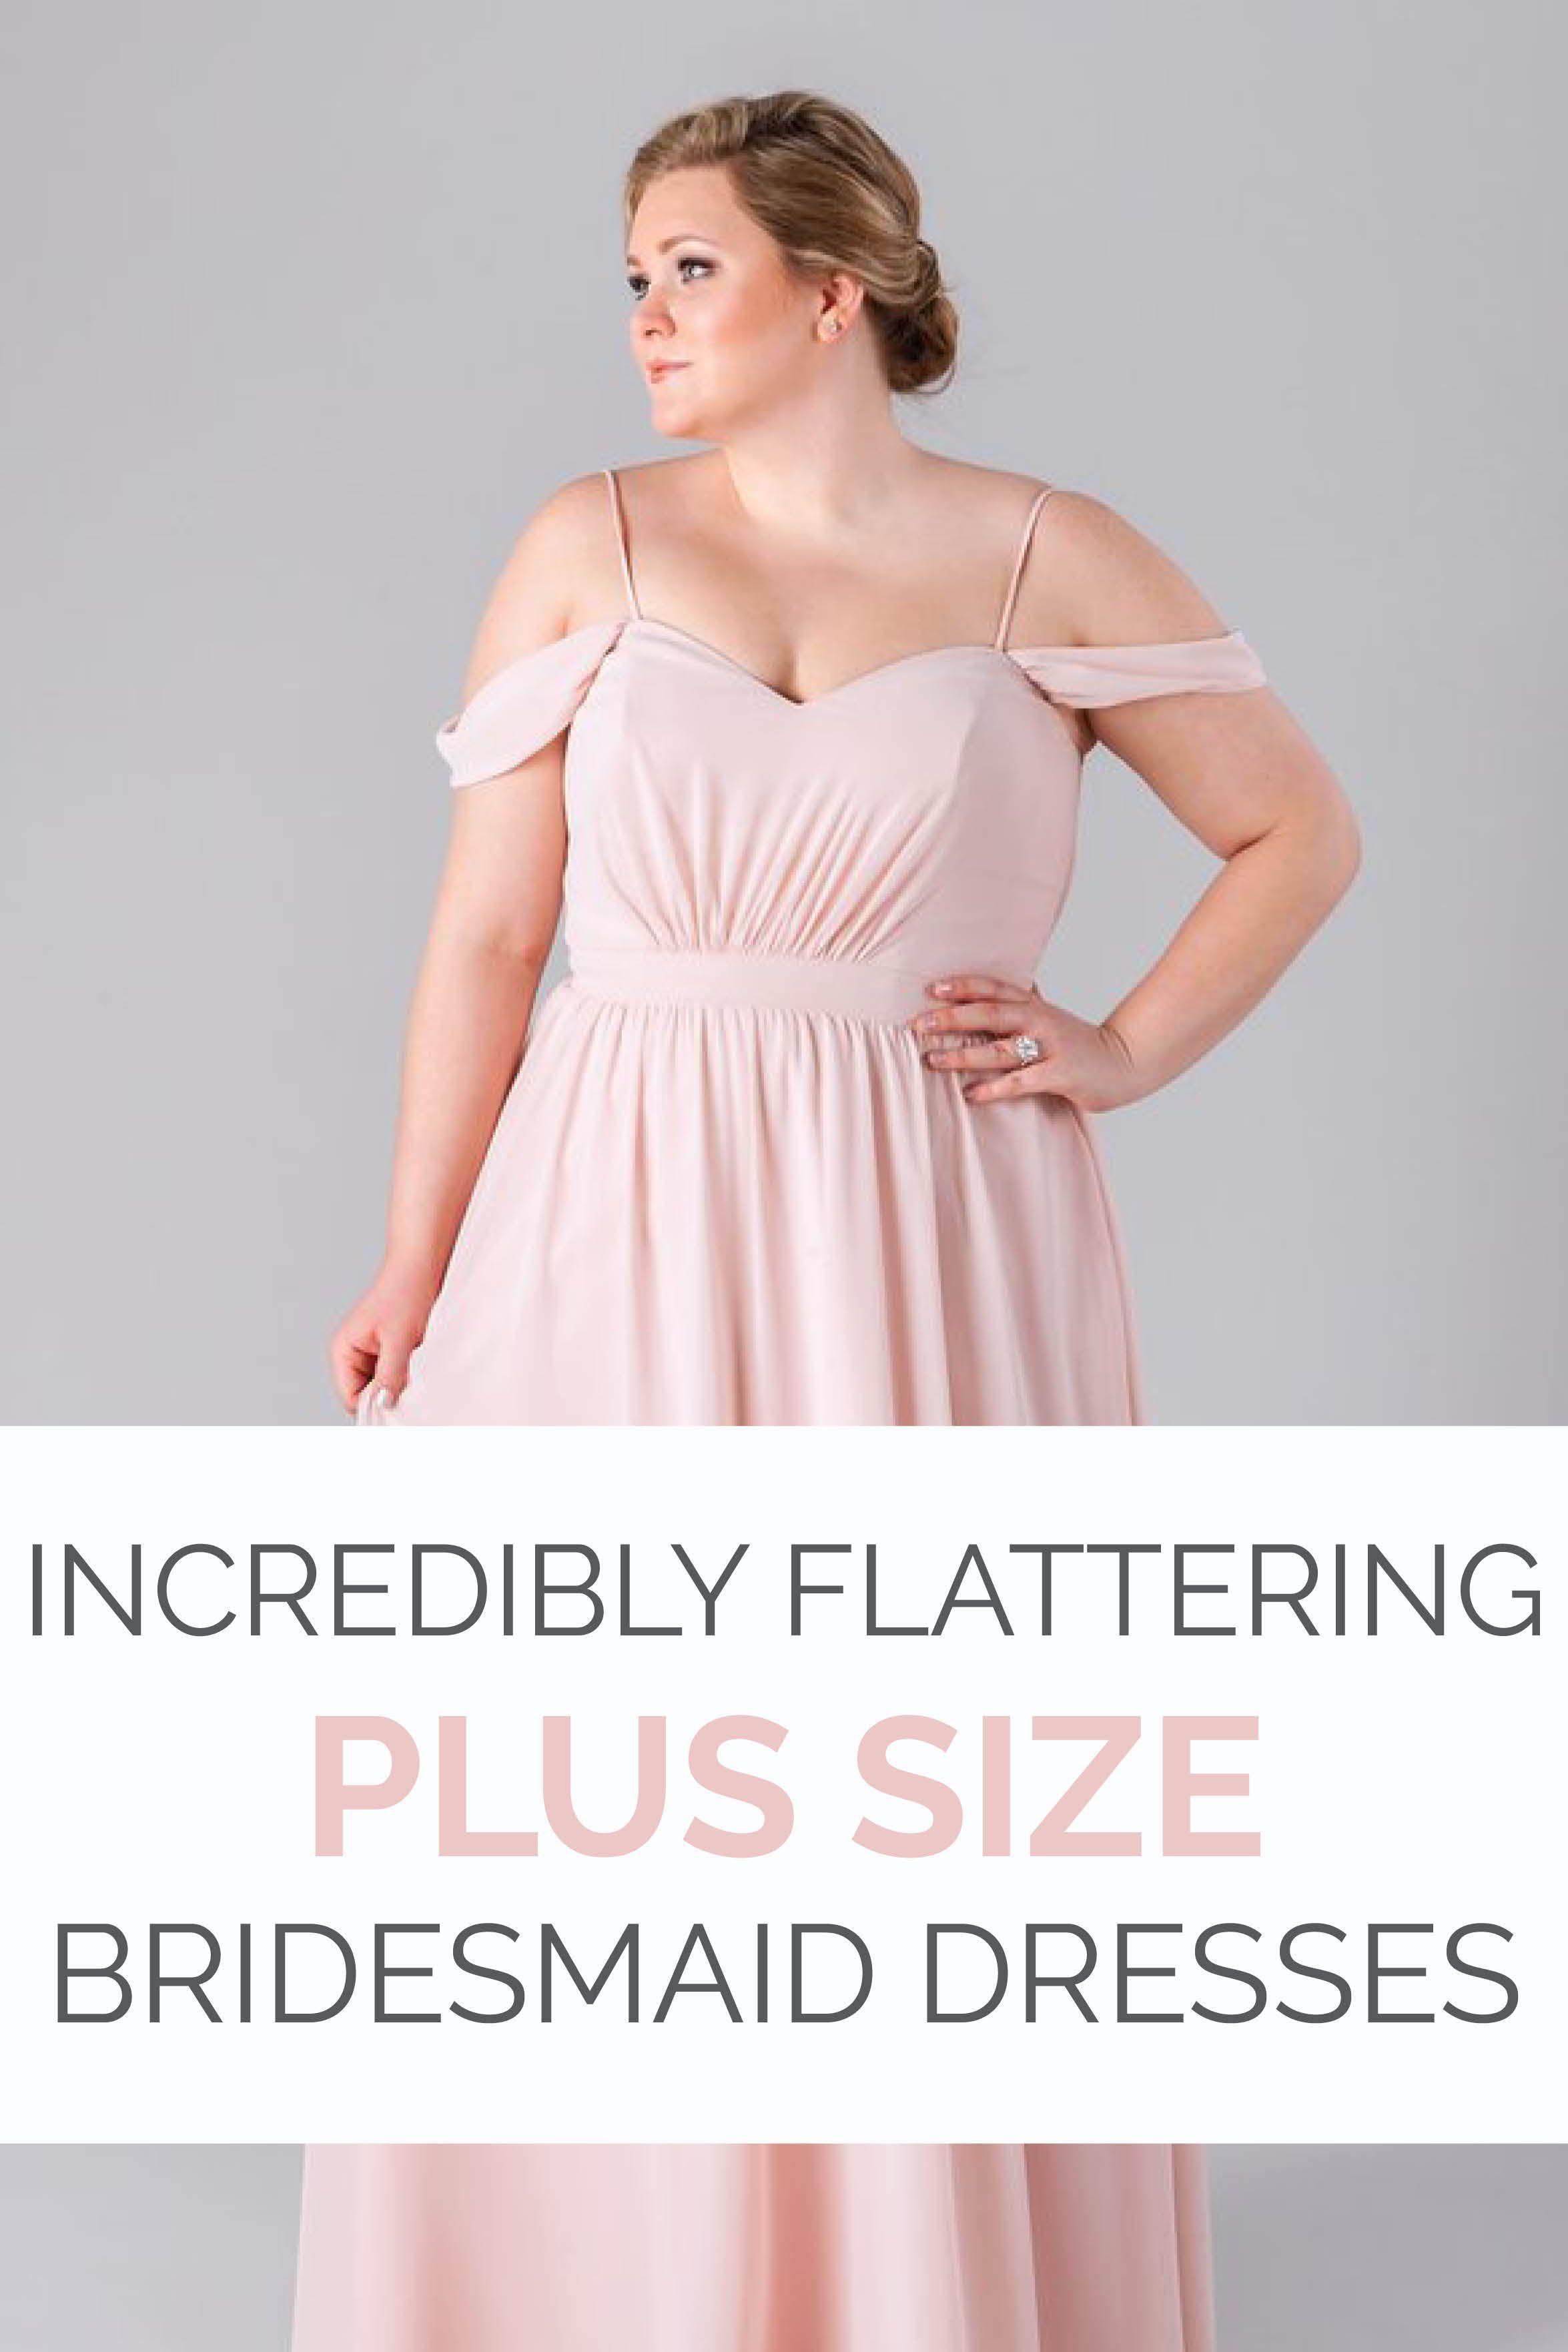 Blue plus size wedding dresses  Incredibly Flattering Plus Size Bridesmaid Dresses  Kennedy Blue